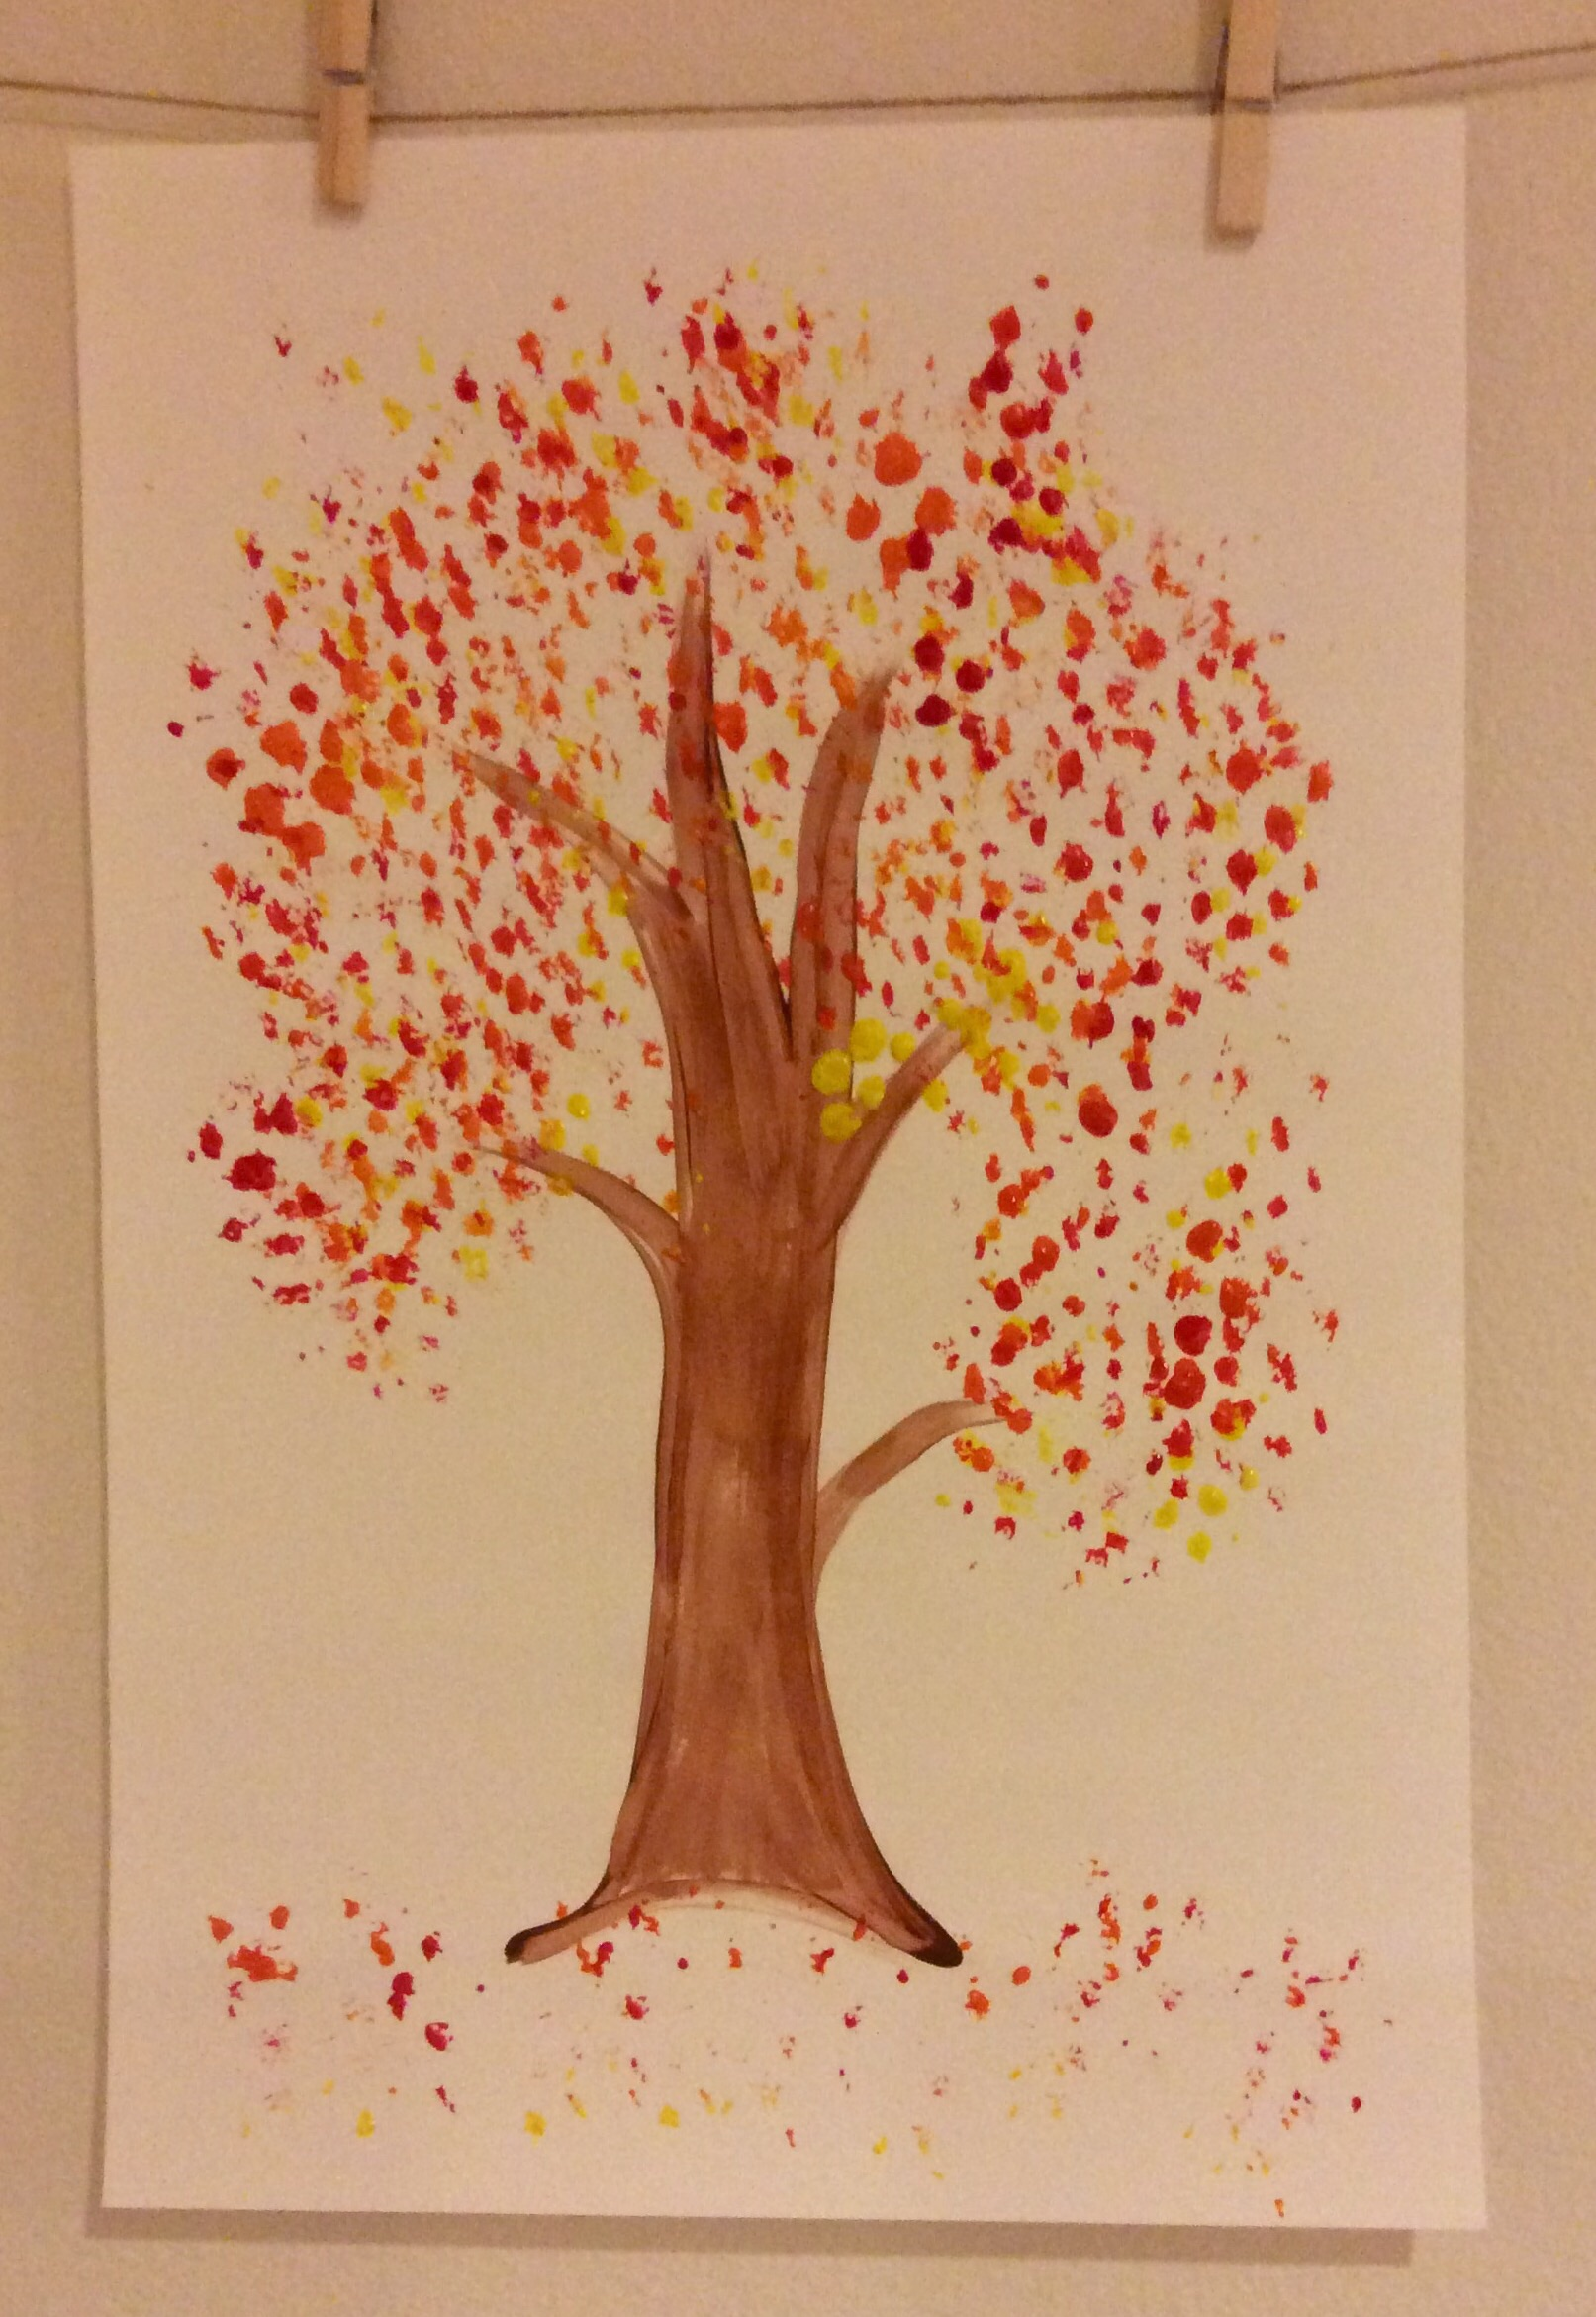 Fall Tree Splatter Painting